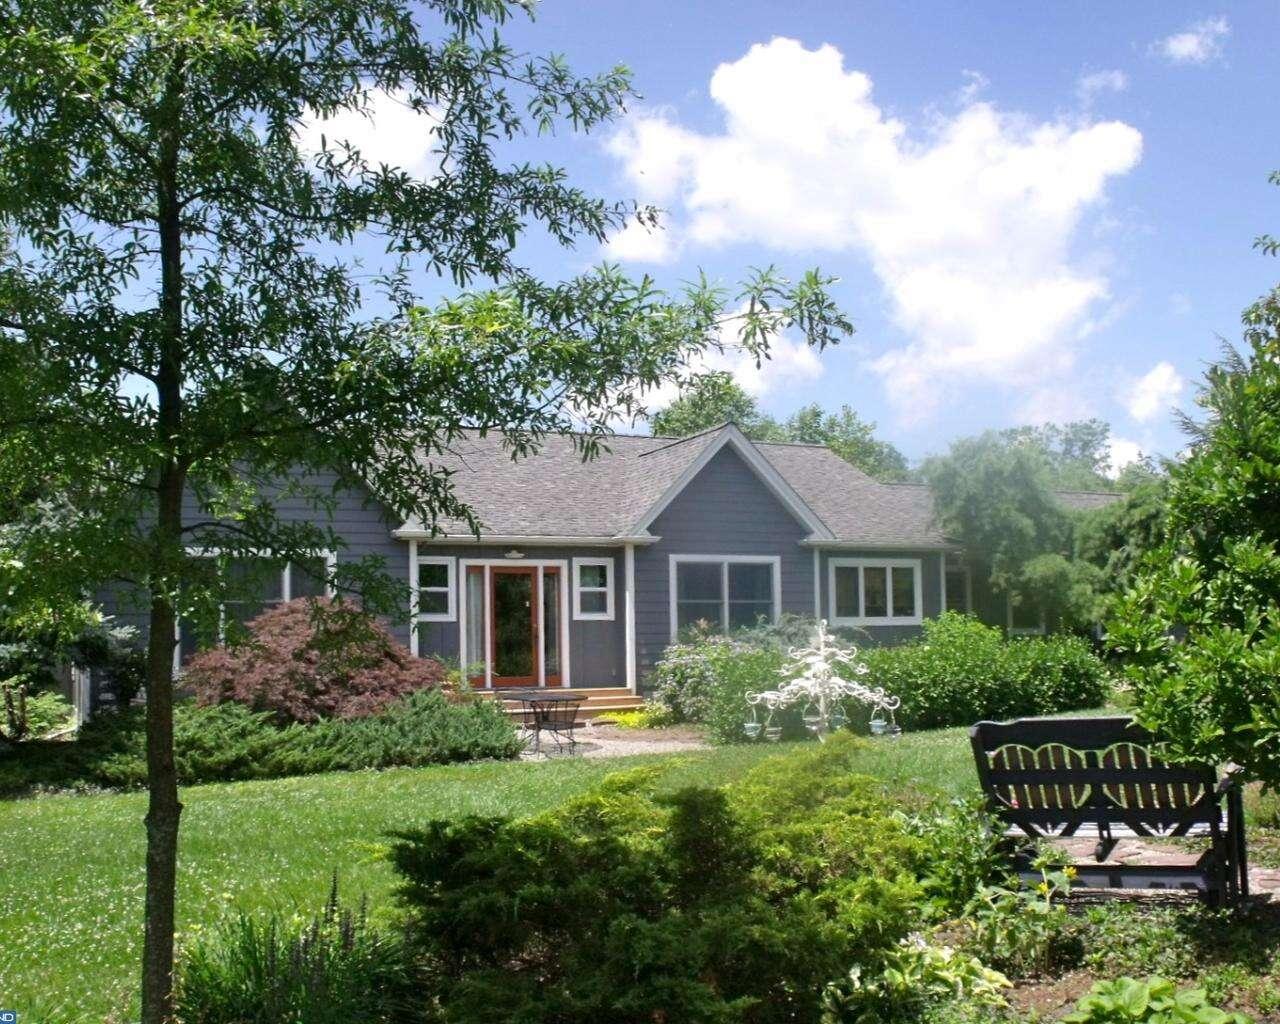 Single Family for Sale at 1306 Green Street Perkasie, Pennsylvania 18944 United States